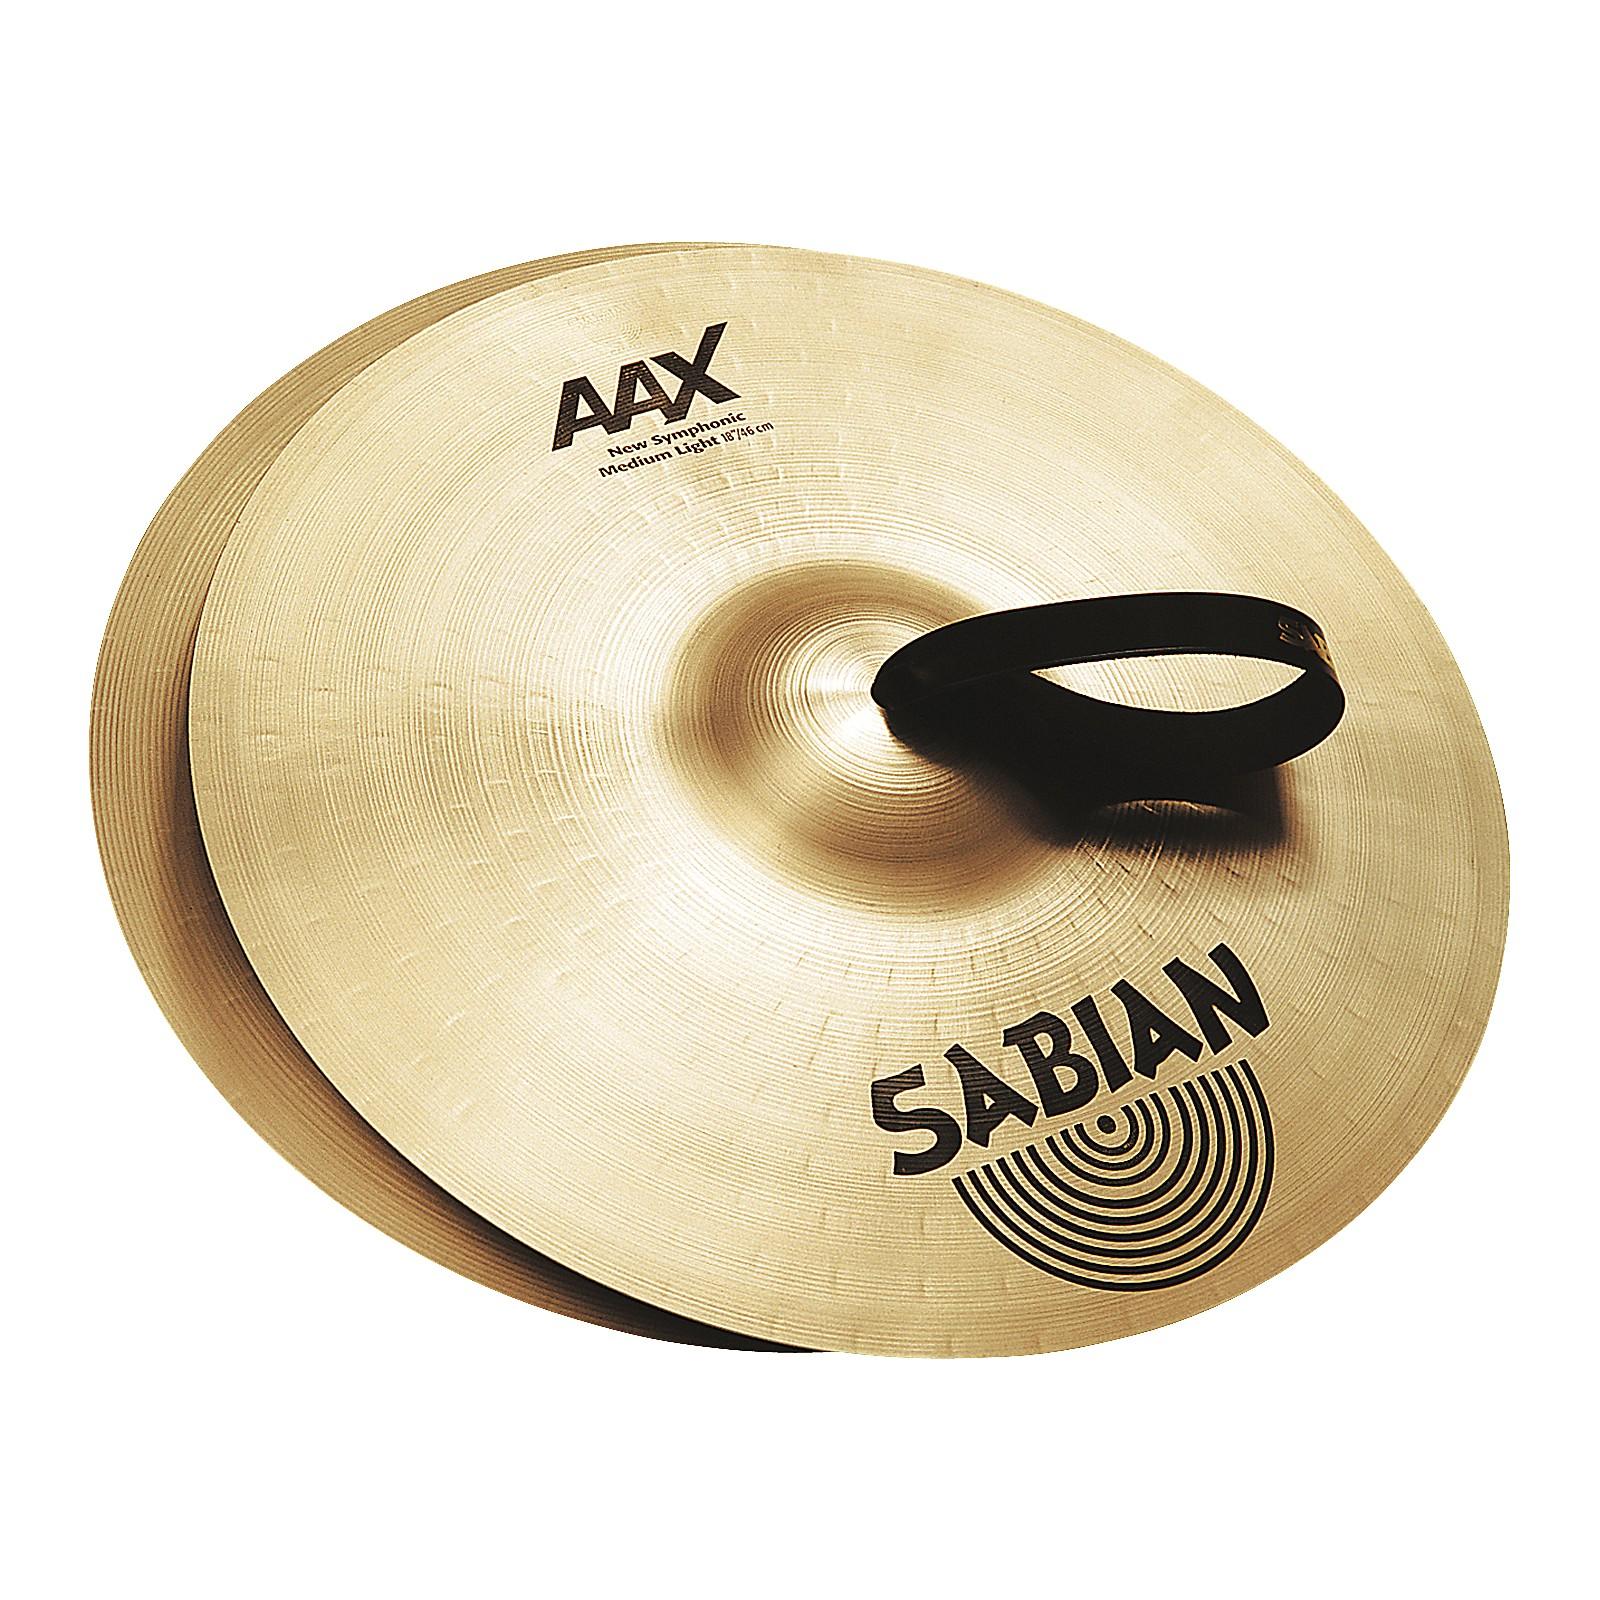 Open Box Sabian AAX New Symphonic Medium Light Cymbal Pair